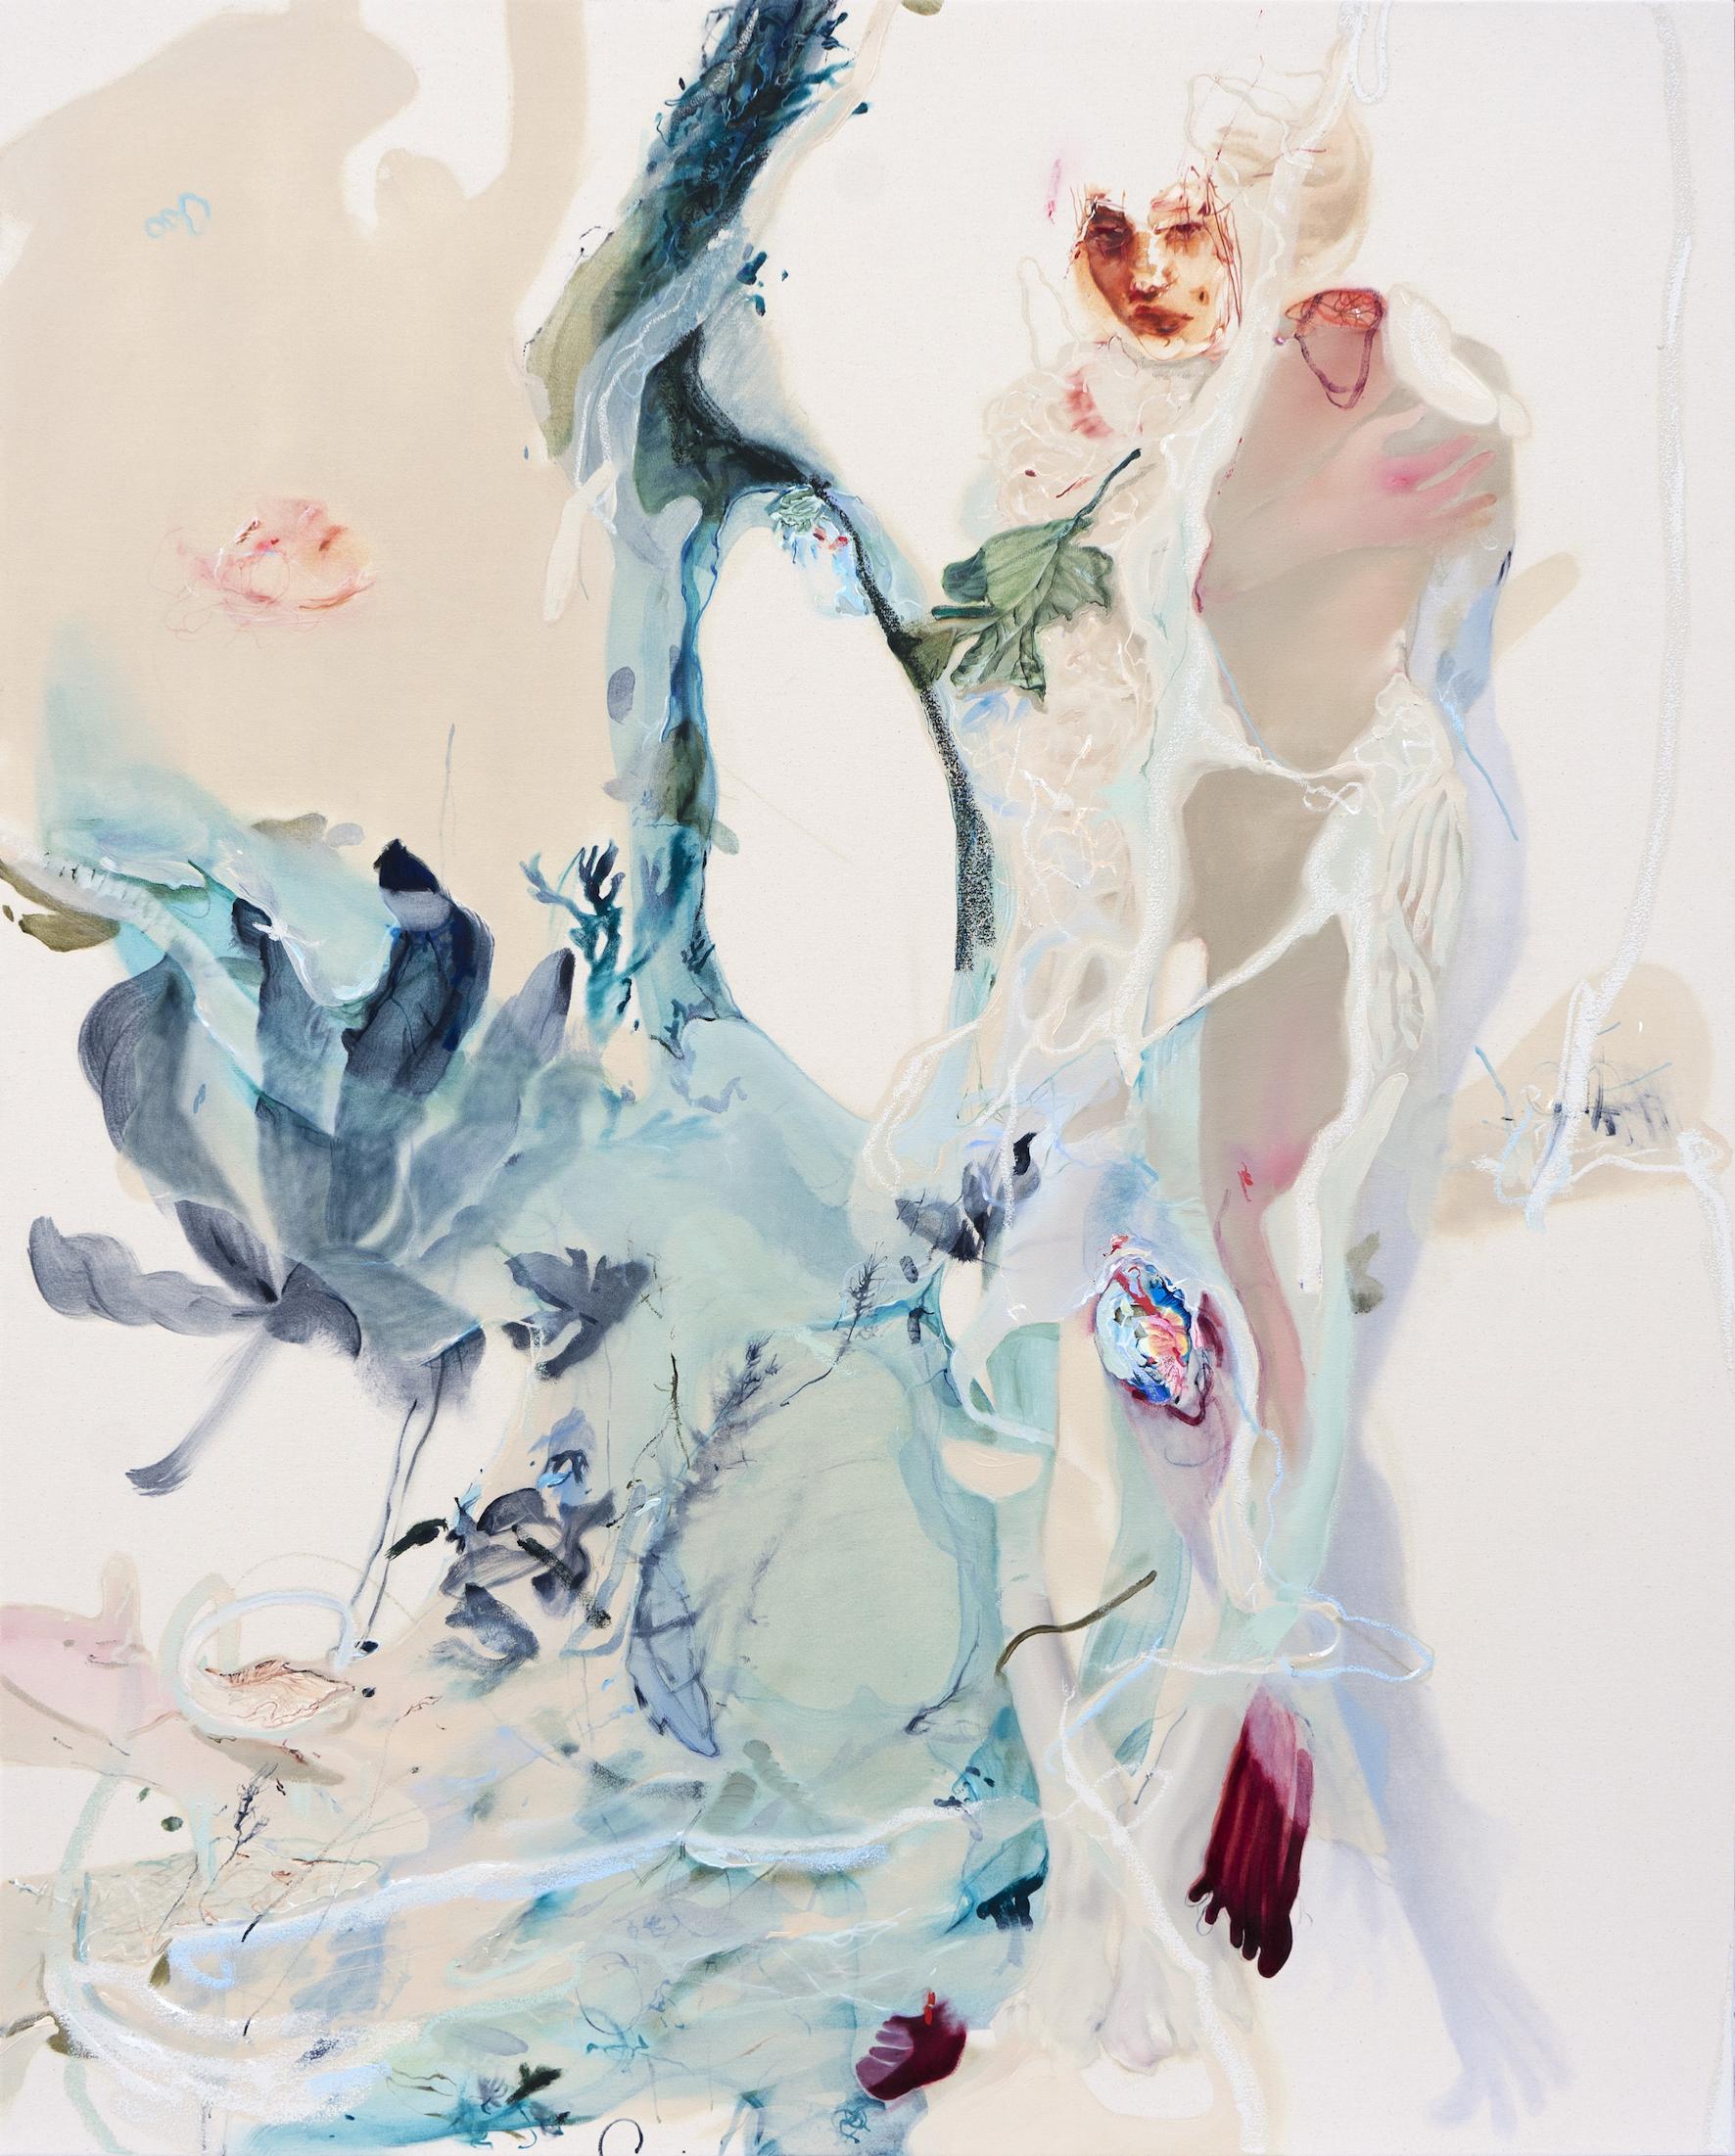 Delta_150 x 120cm_oil on canvas_2021